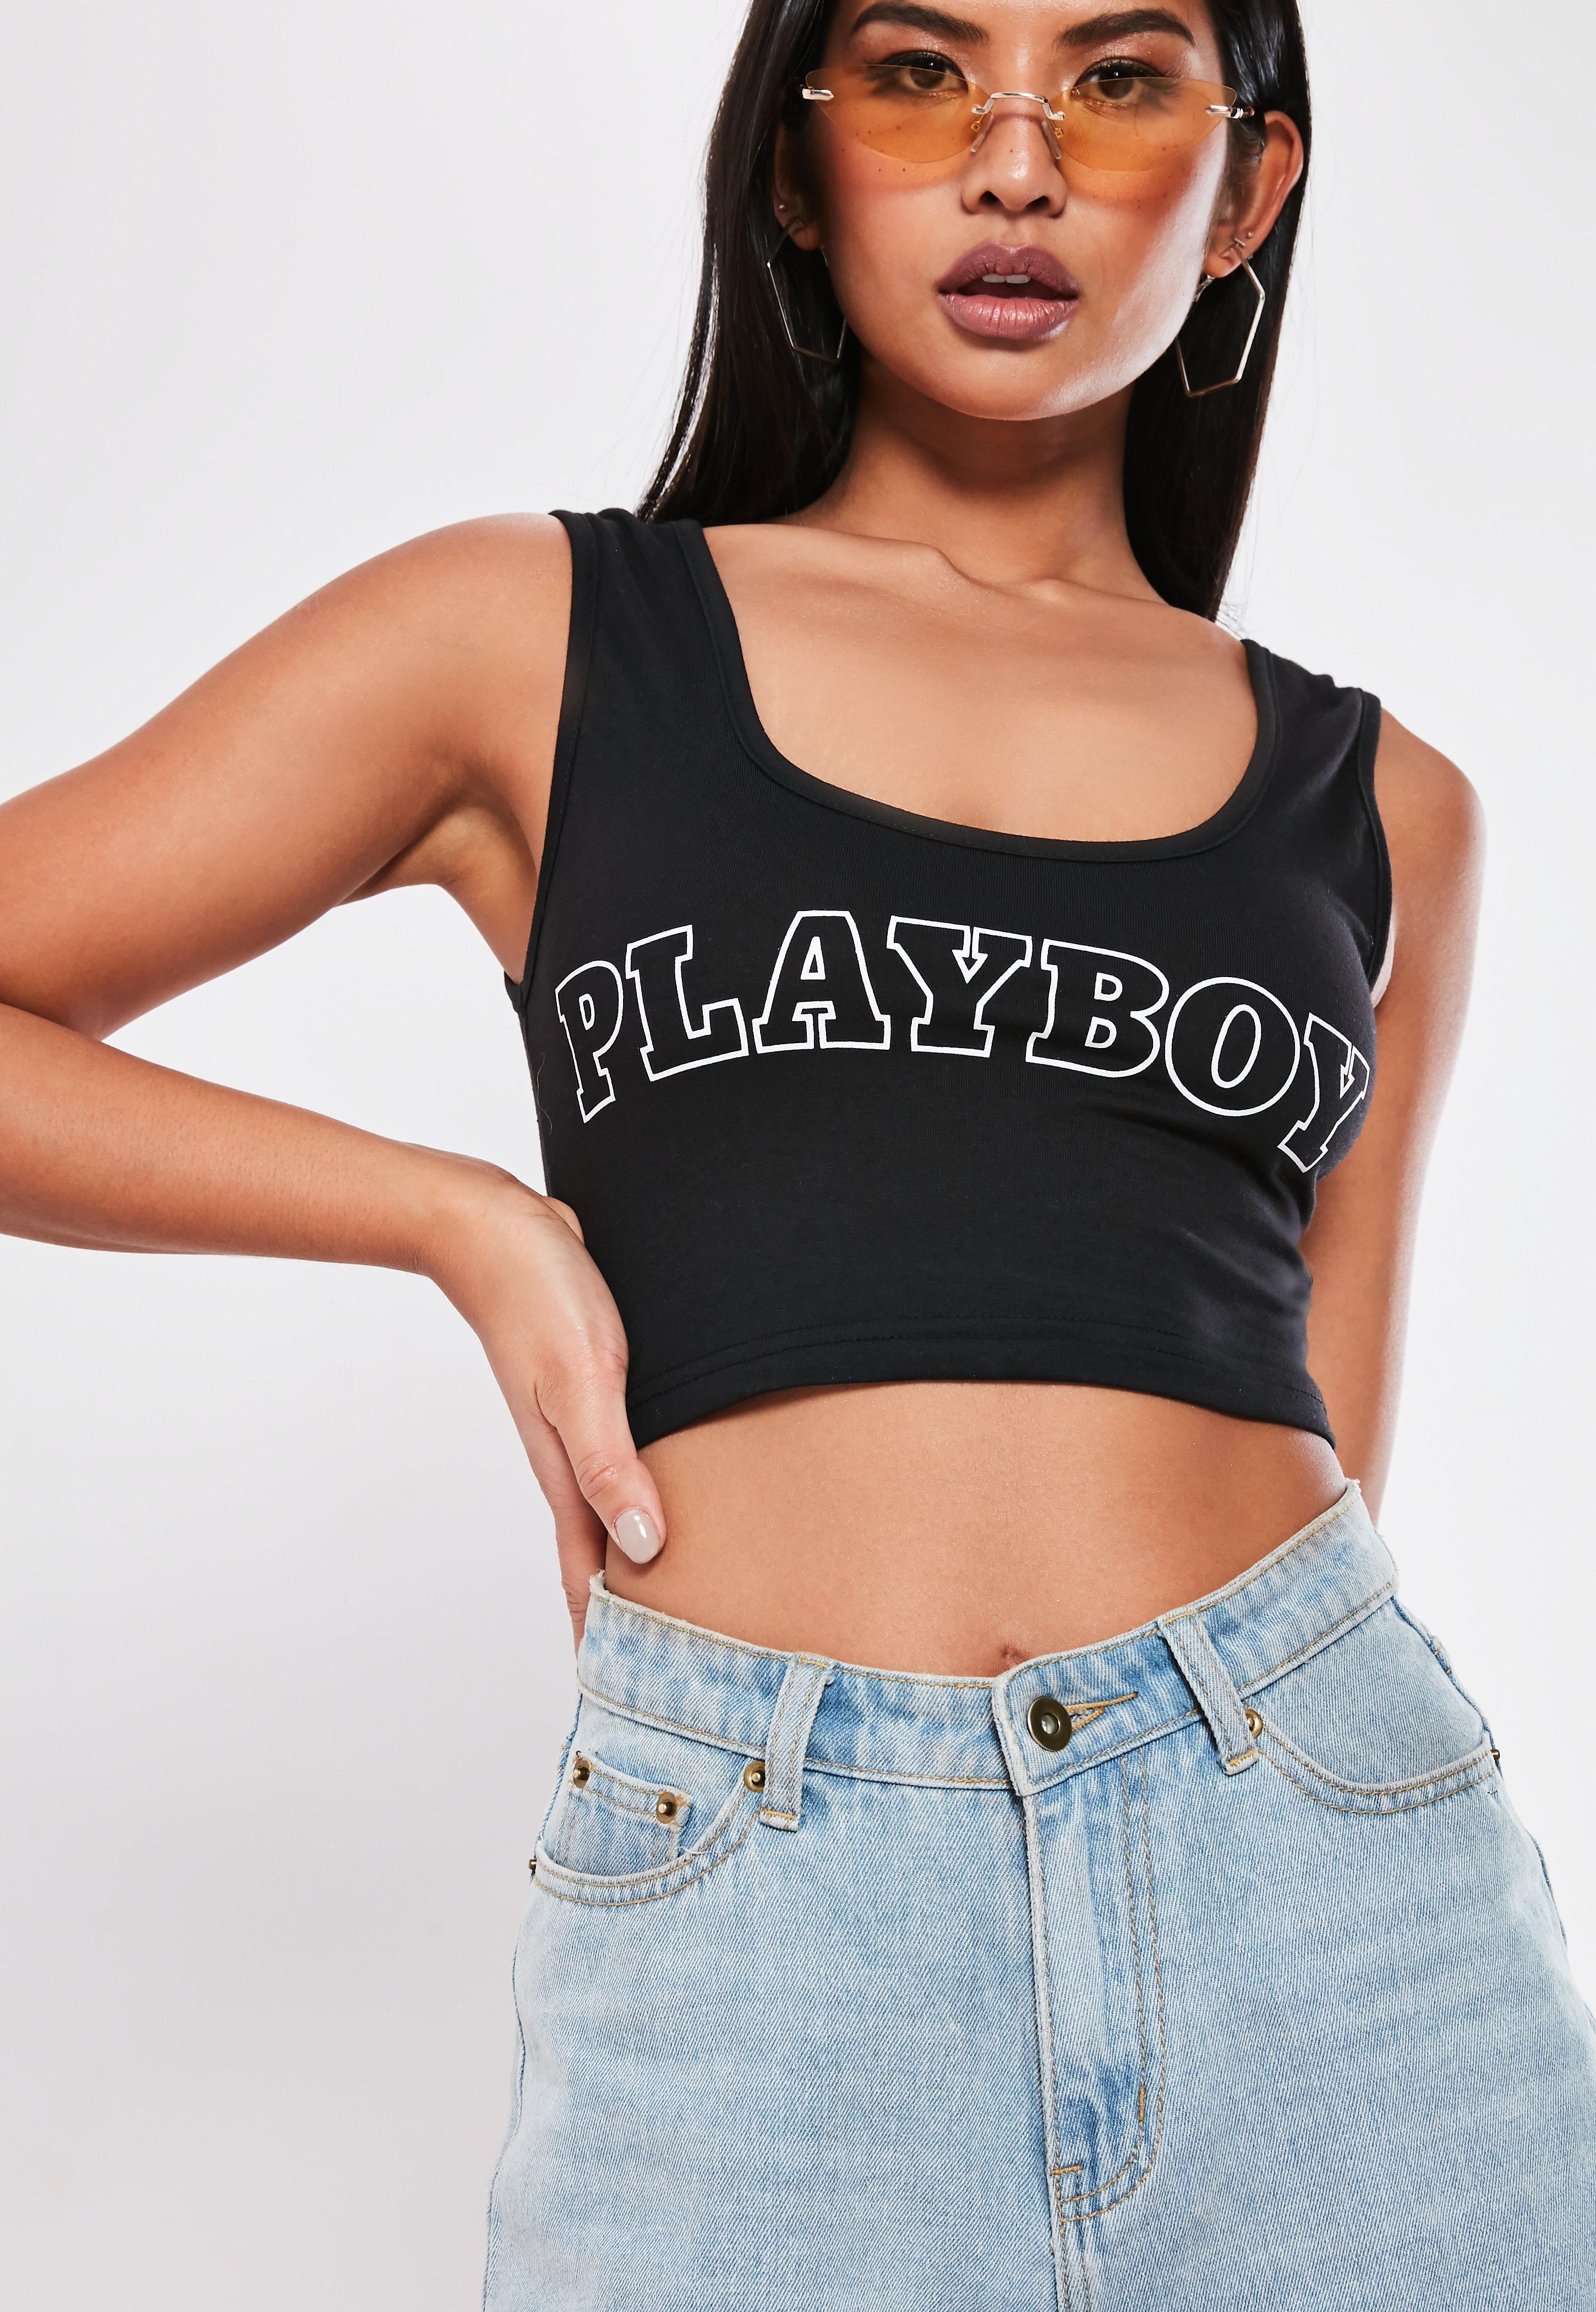 b0cba292ecd98 Missguided - Playboy X Black Slogan Scoop Neck Crop Top - Lyst. View  fullscreen